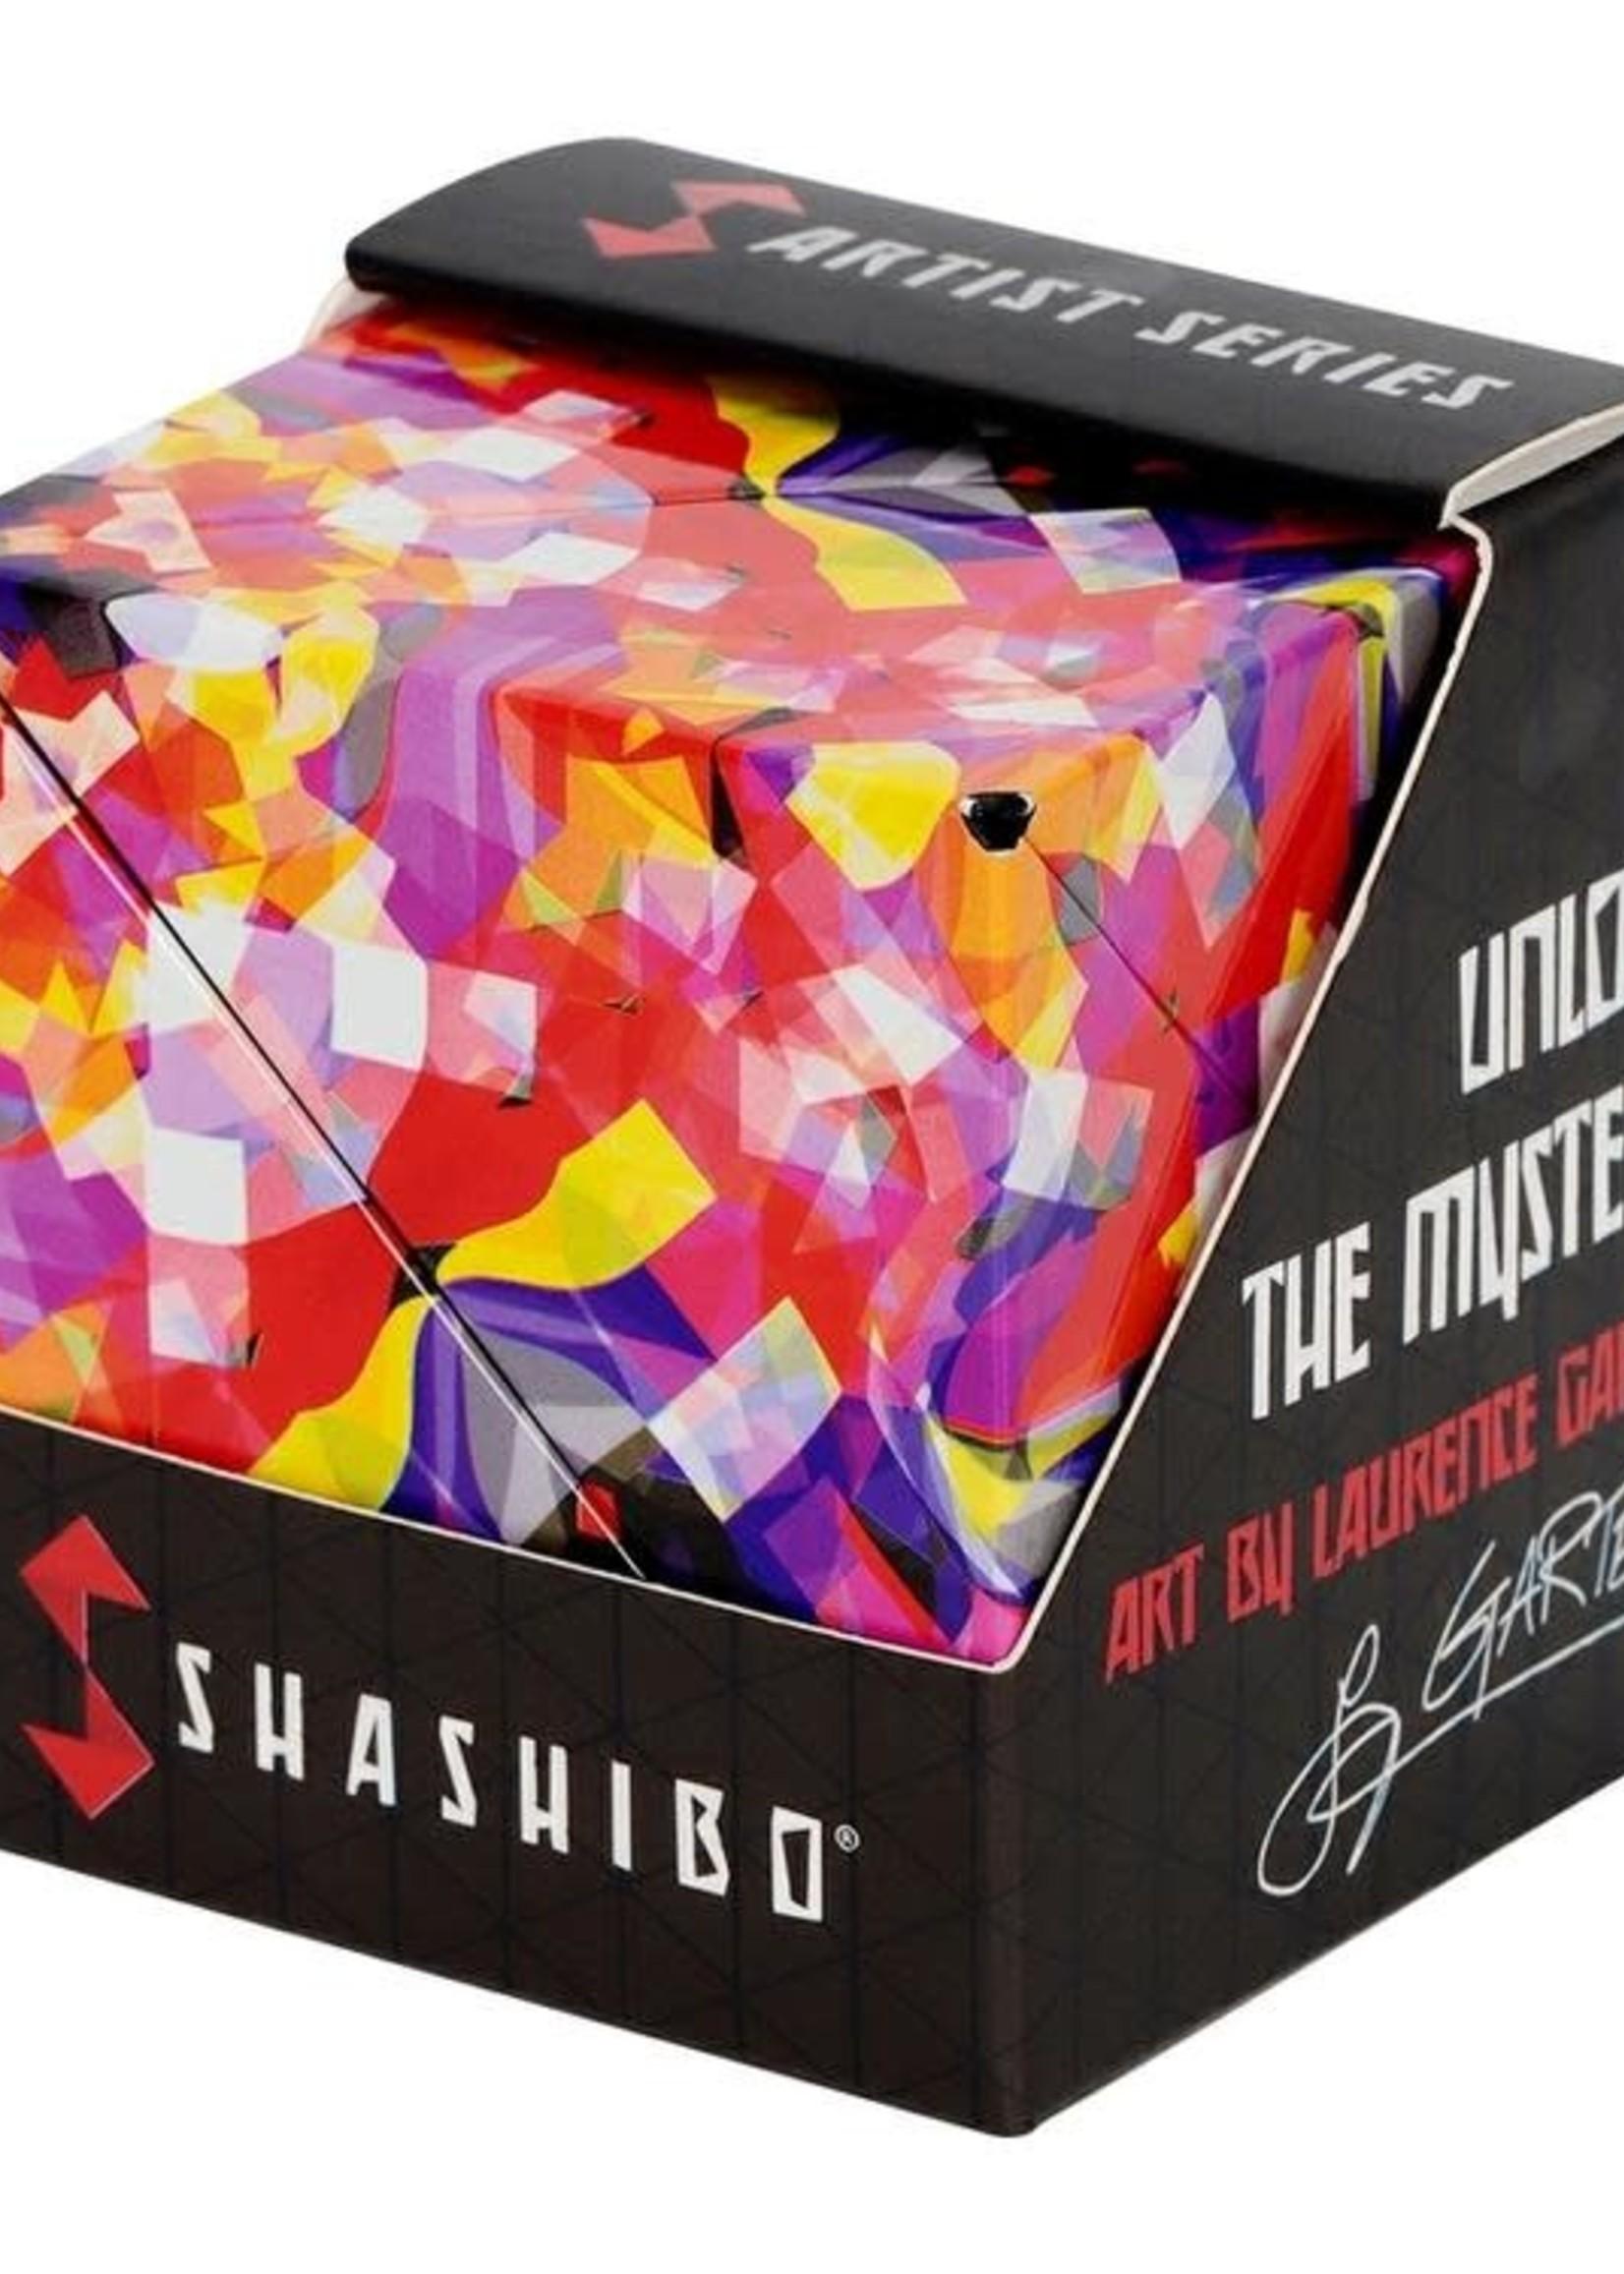 SHASHIBO (Artist Series - Confetti)